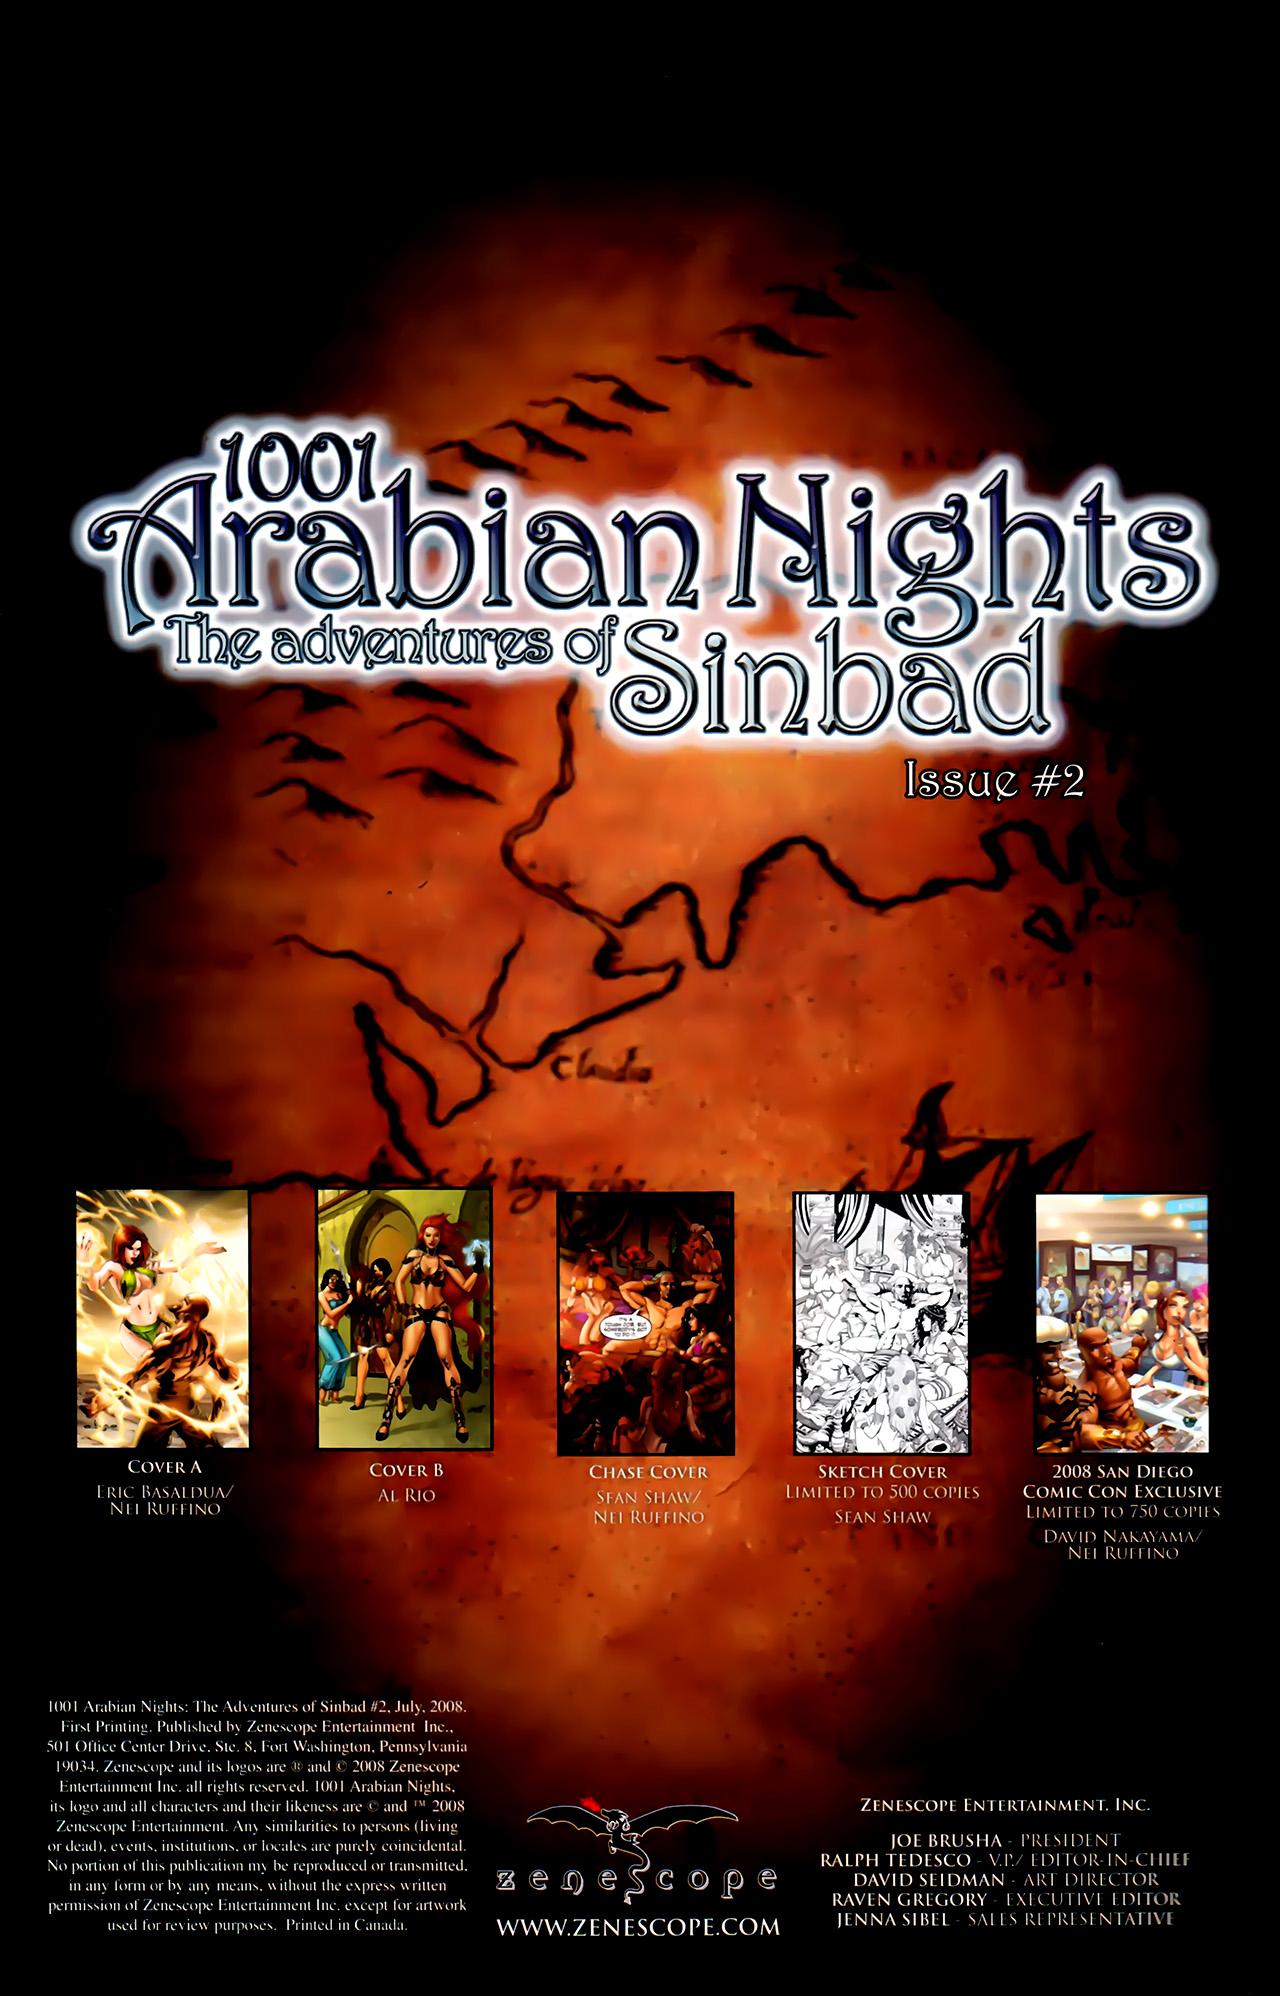 Read online 1001 Arabian Nights: The Adventures of Sinbad comic -  Issue #2 - 6